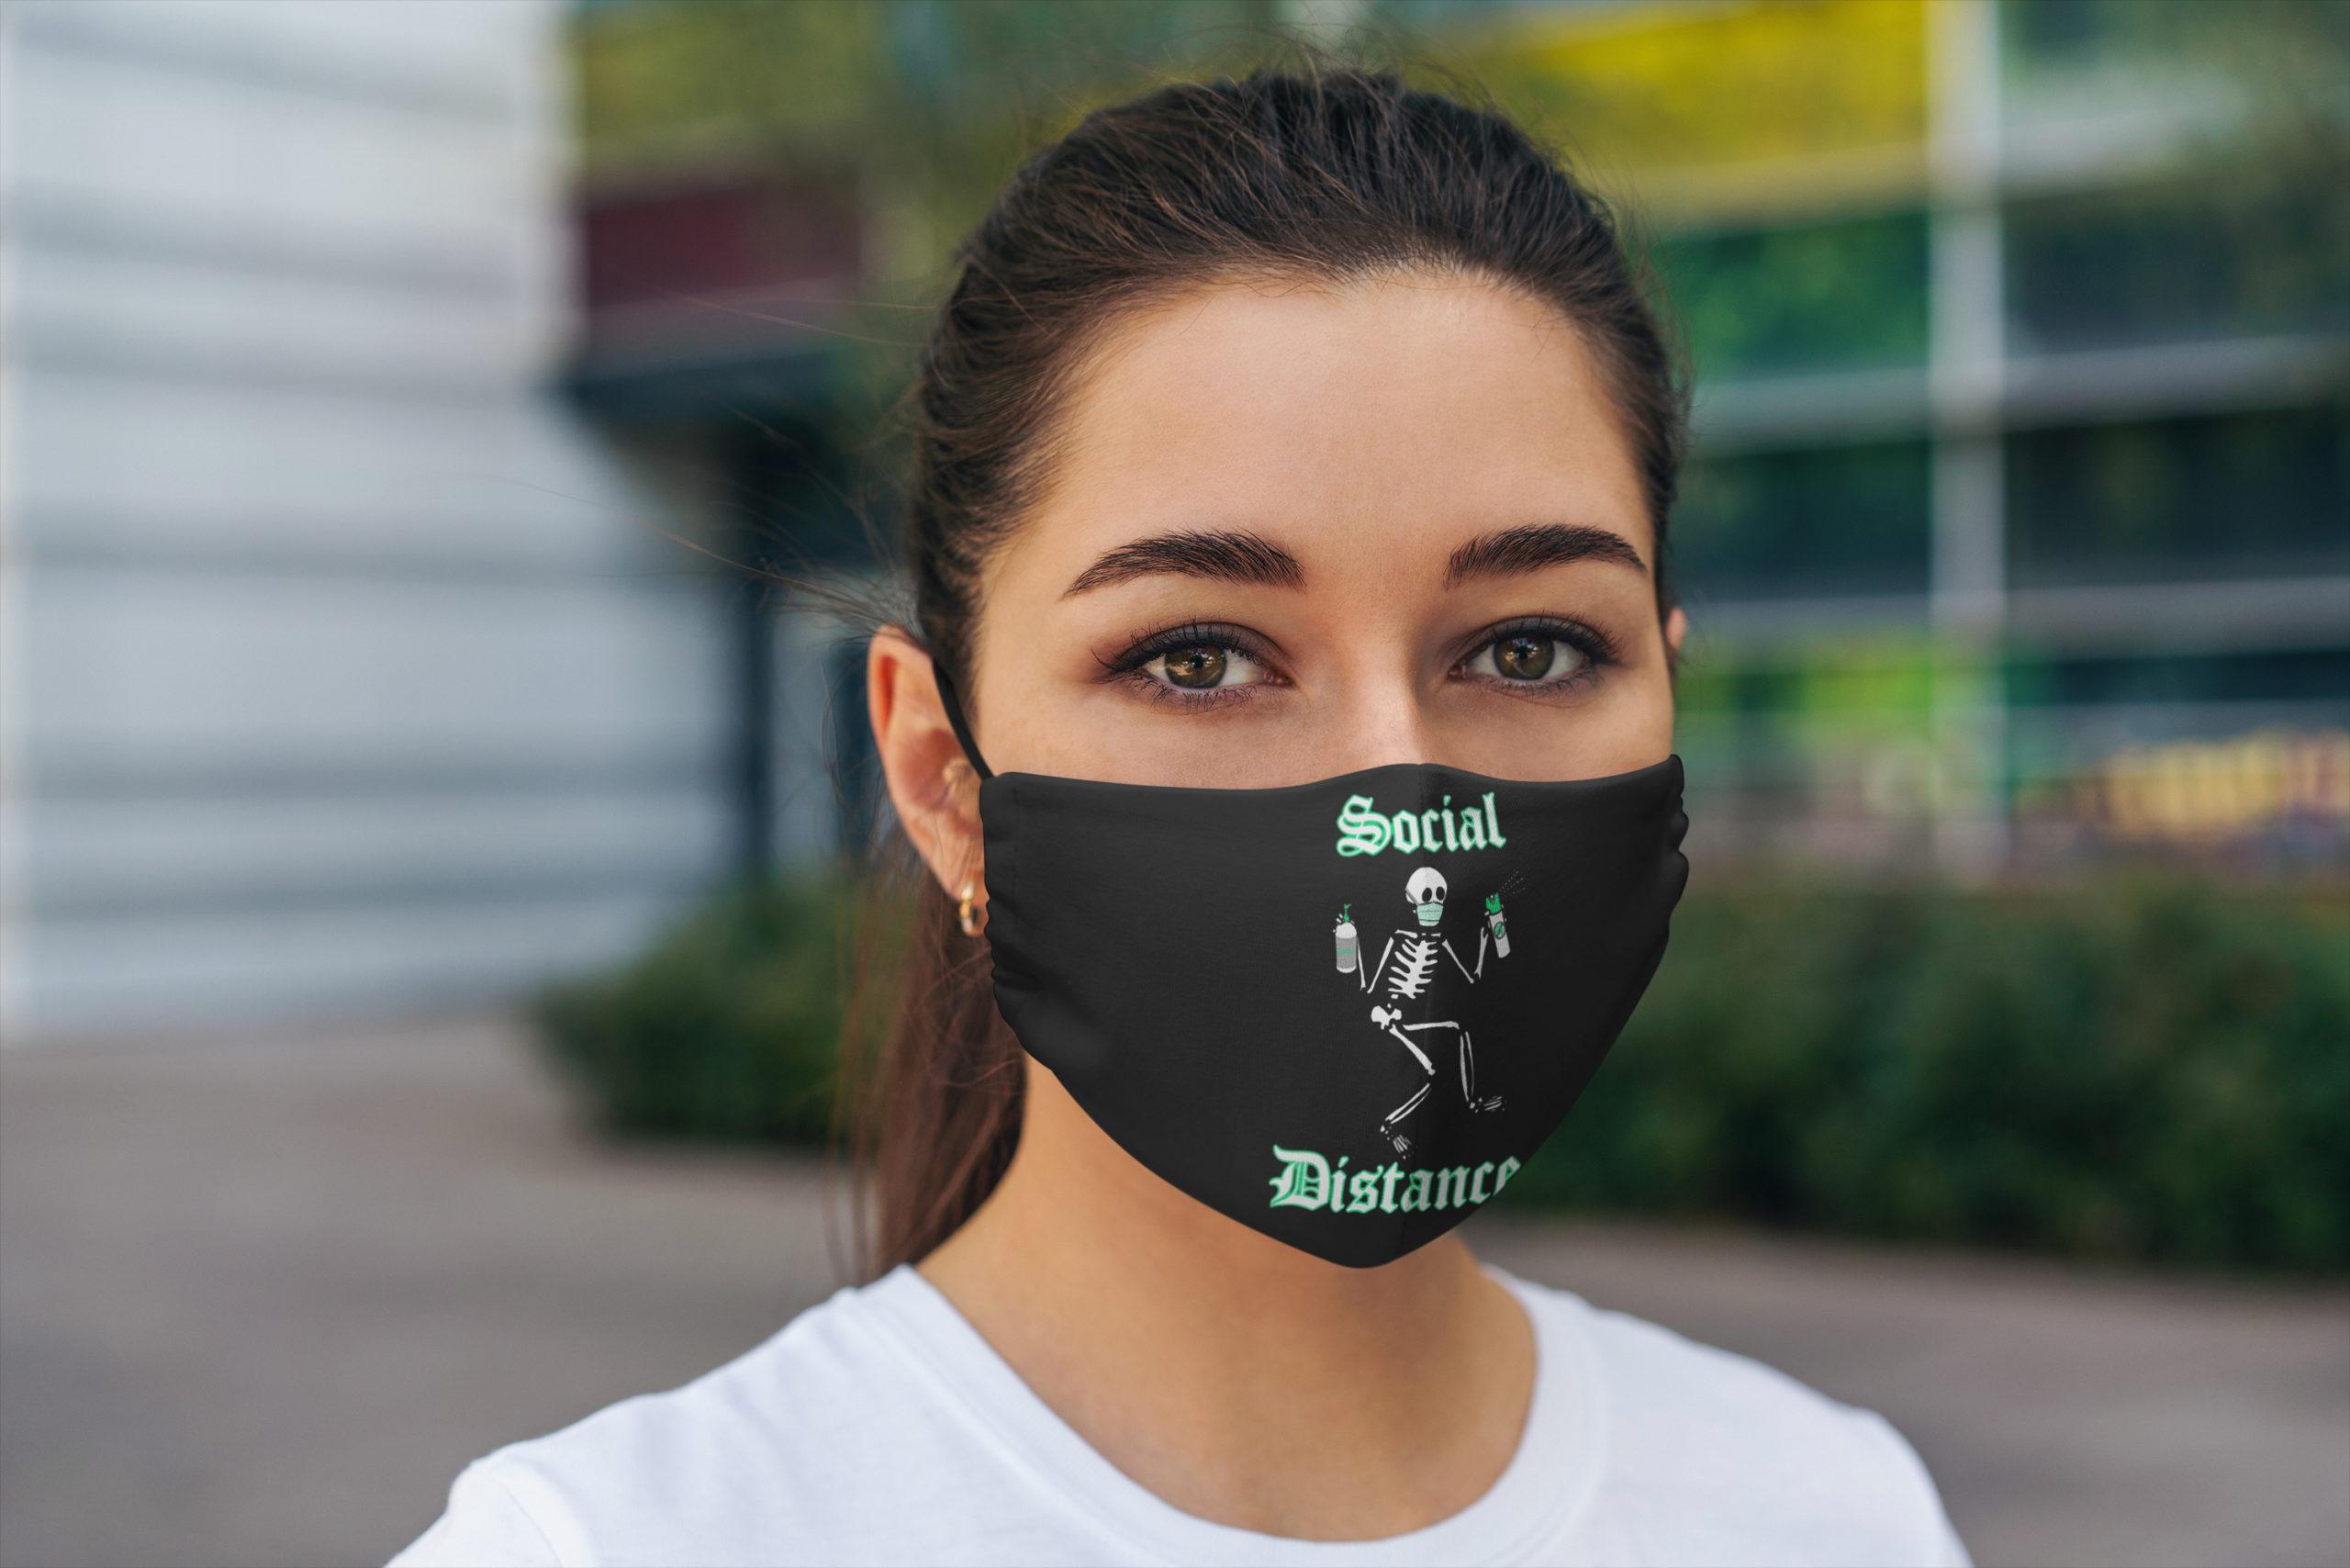 Social distance skeleton all over printed face mask 3